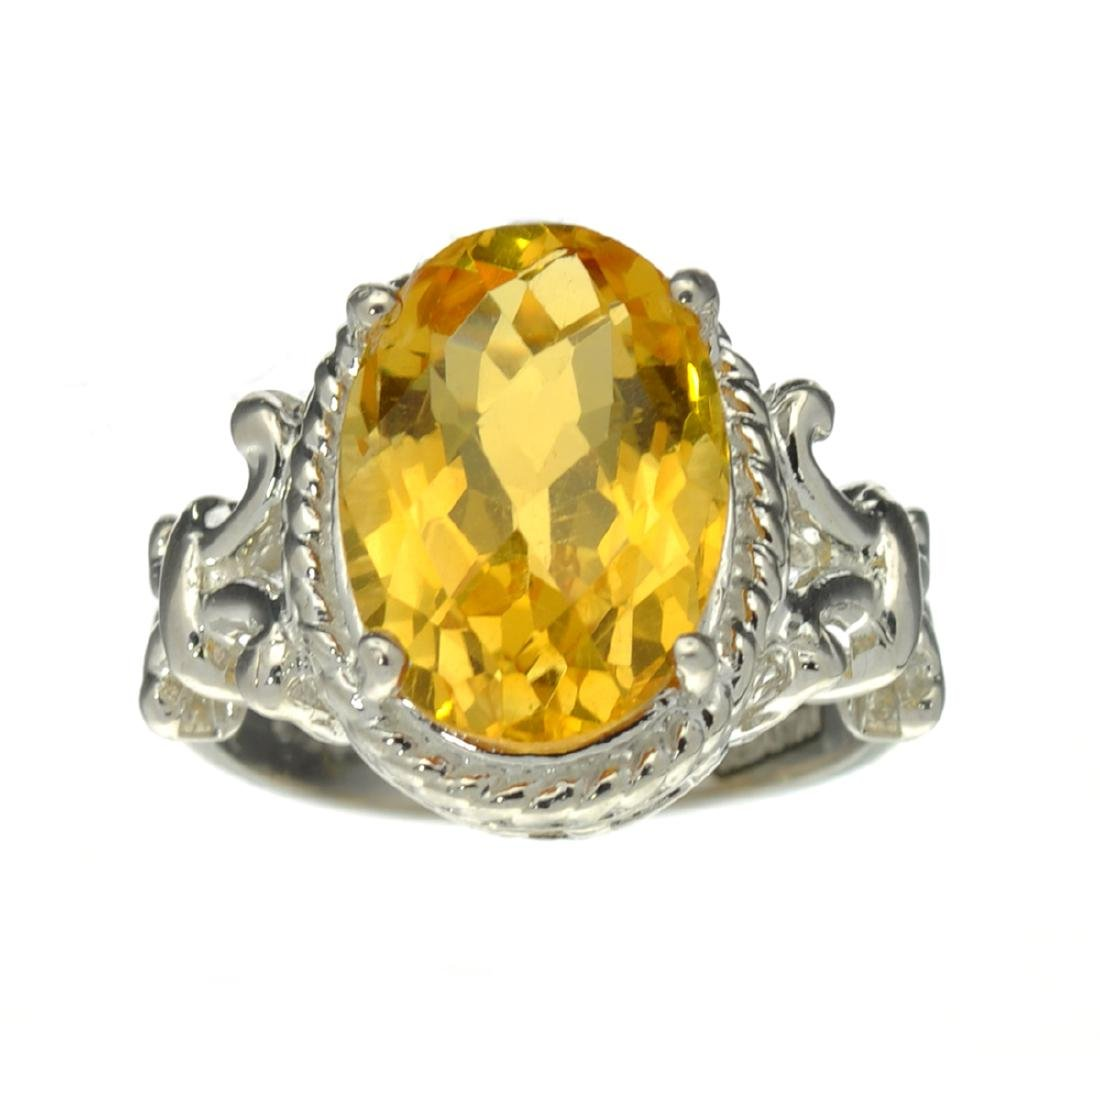 APP: 0.5k Fine Jewelry Designer Sebastian, 5.01CT Oval